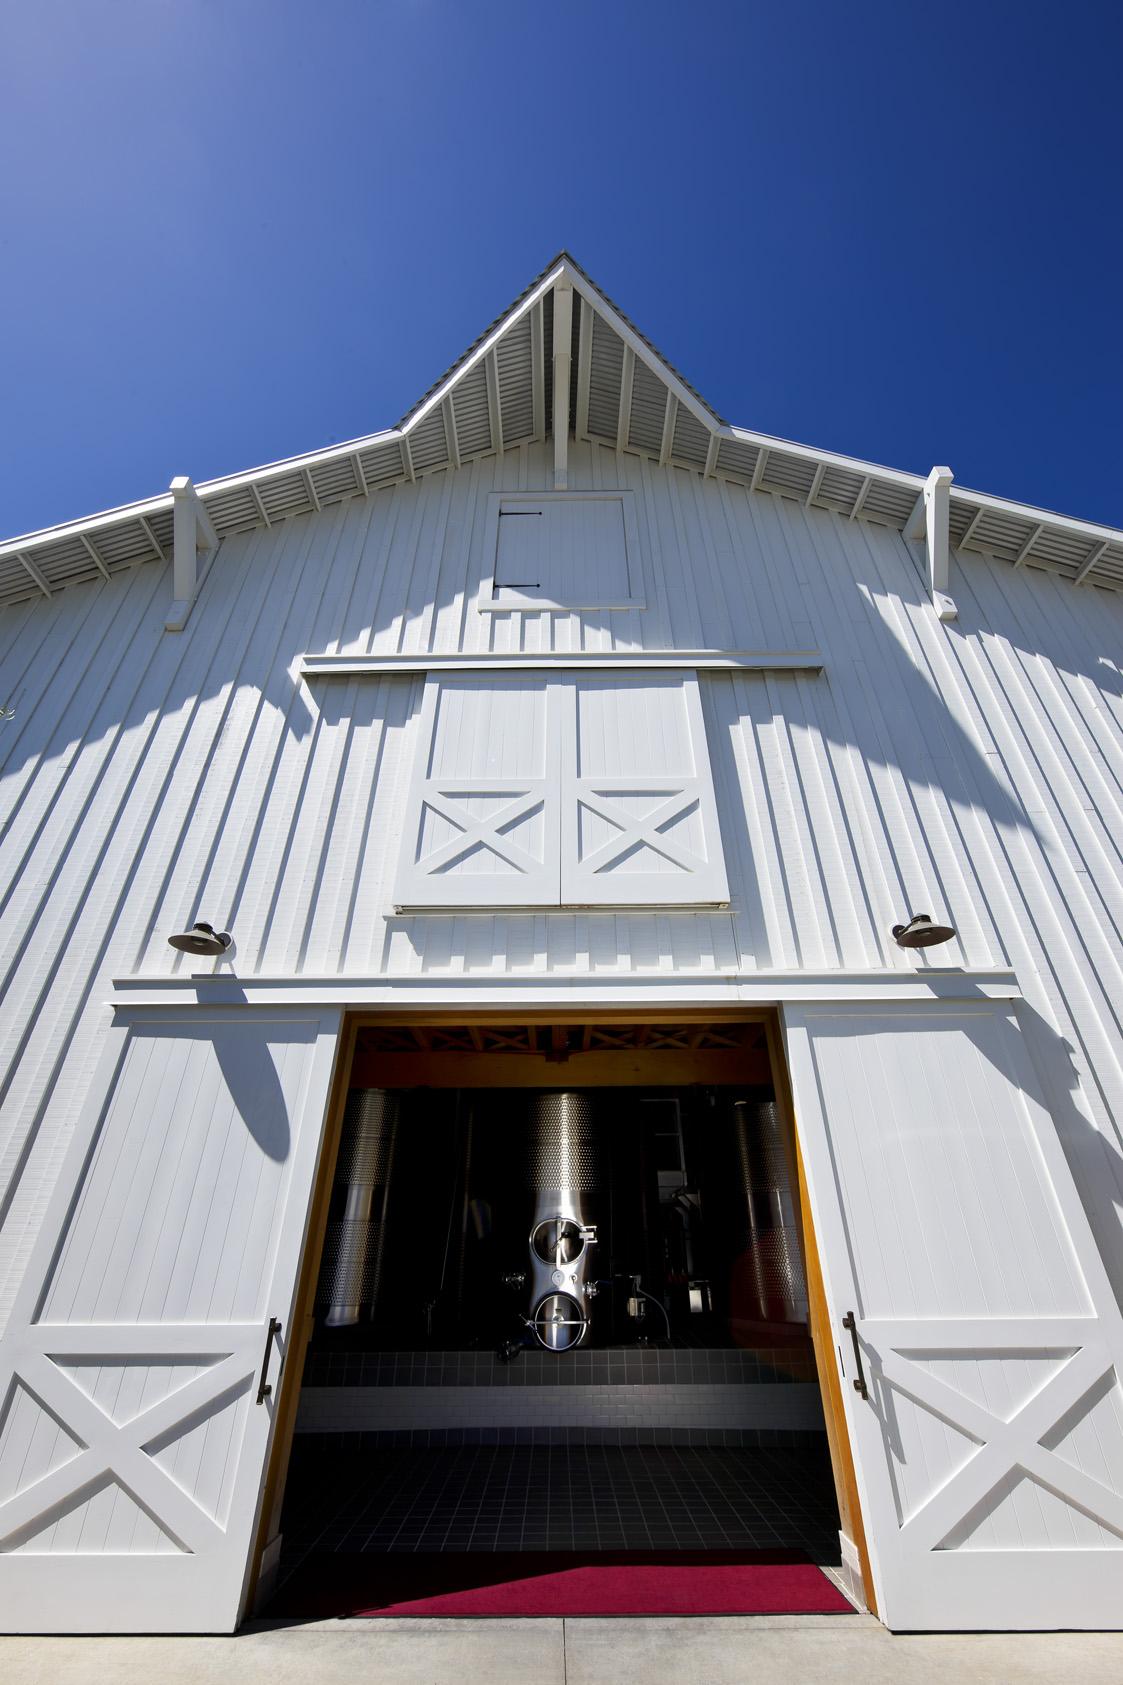 Nickel & Nickel South Fermentation Barn